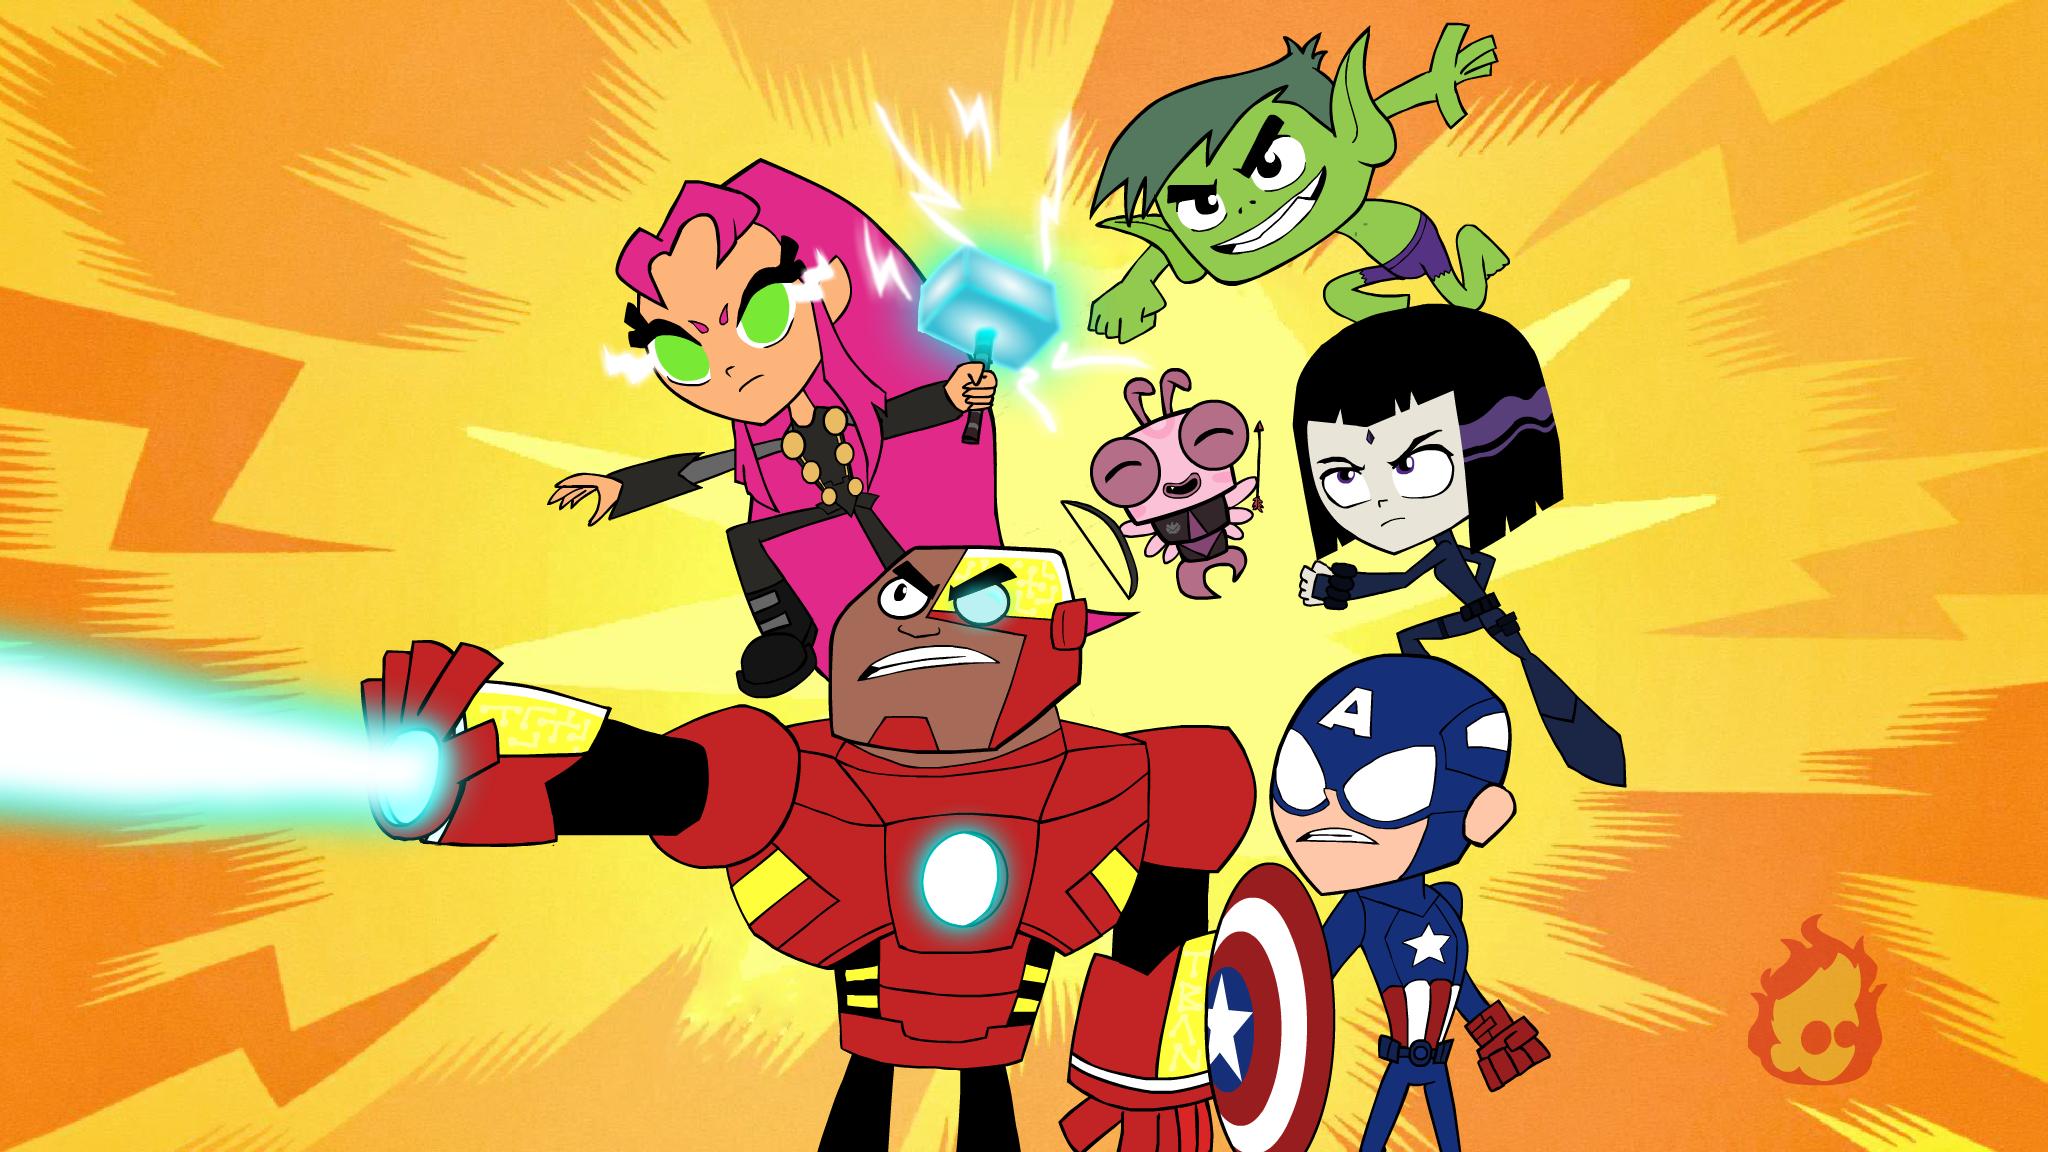 [31+] Teen Titans Go! Wallpapers on WallpaperSafari